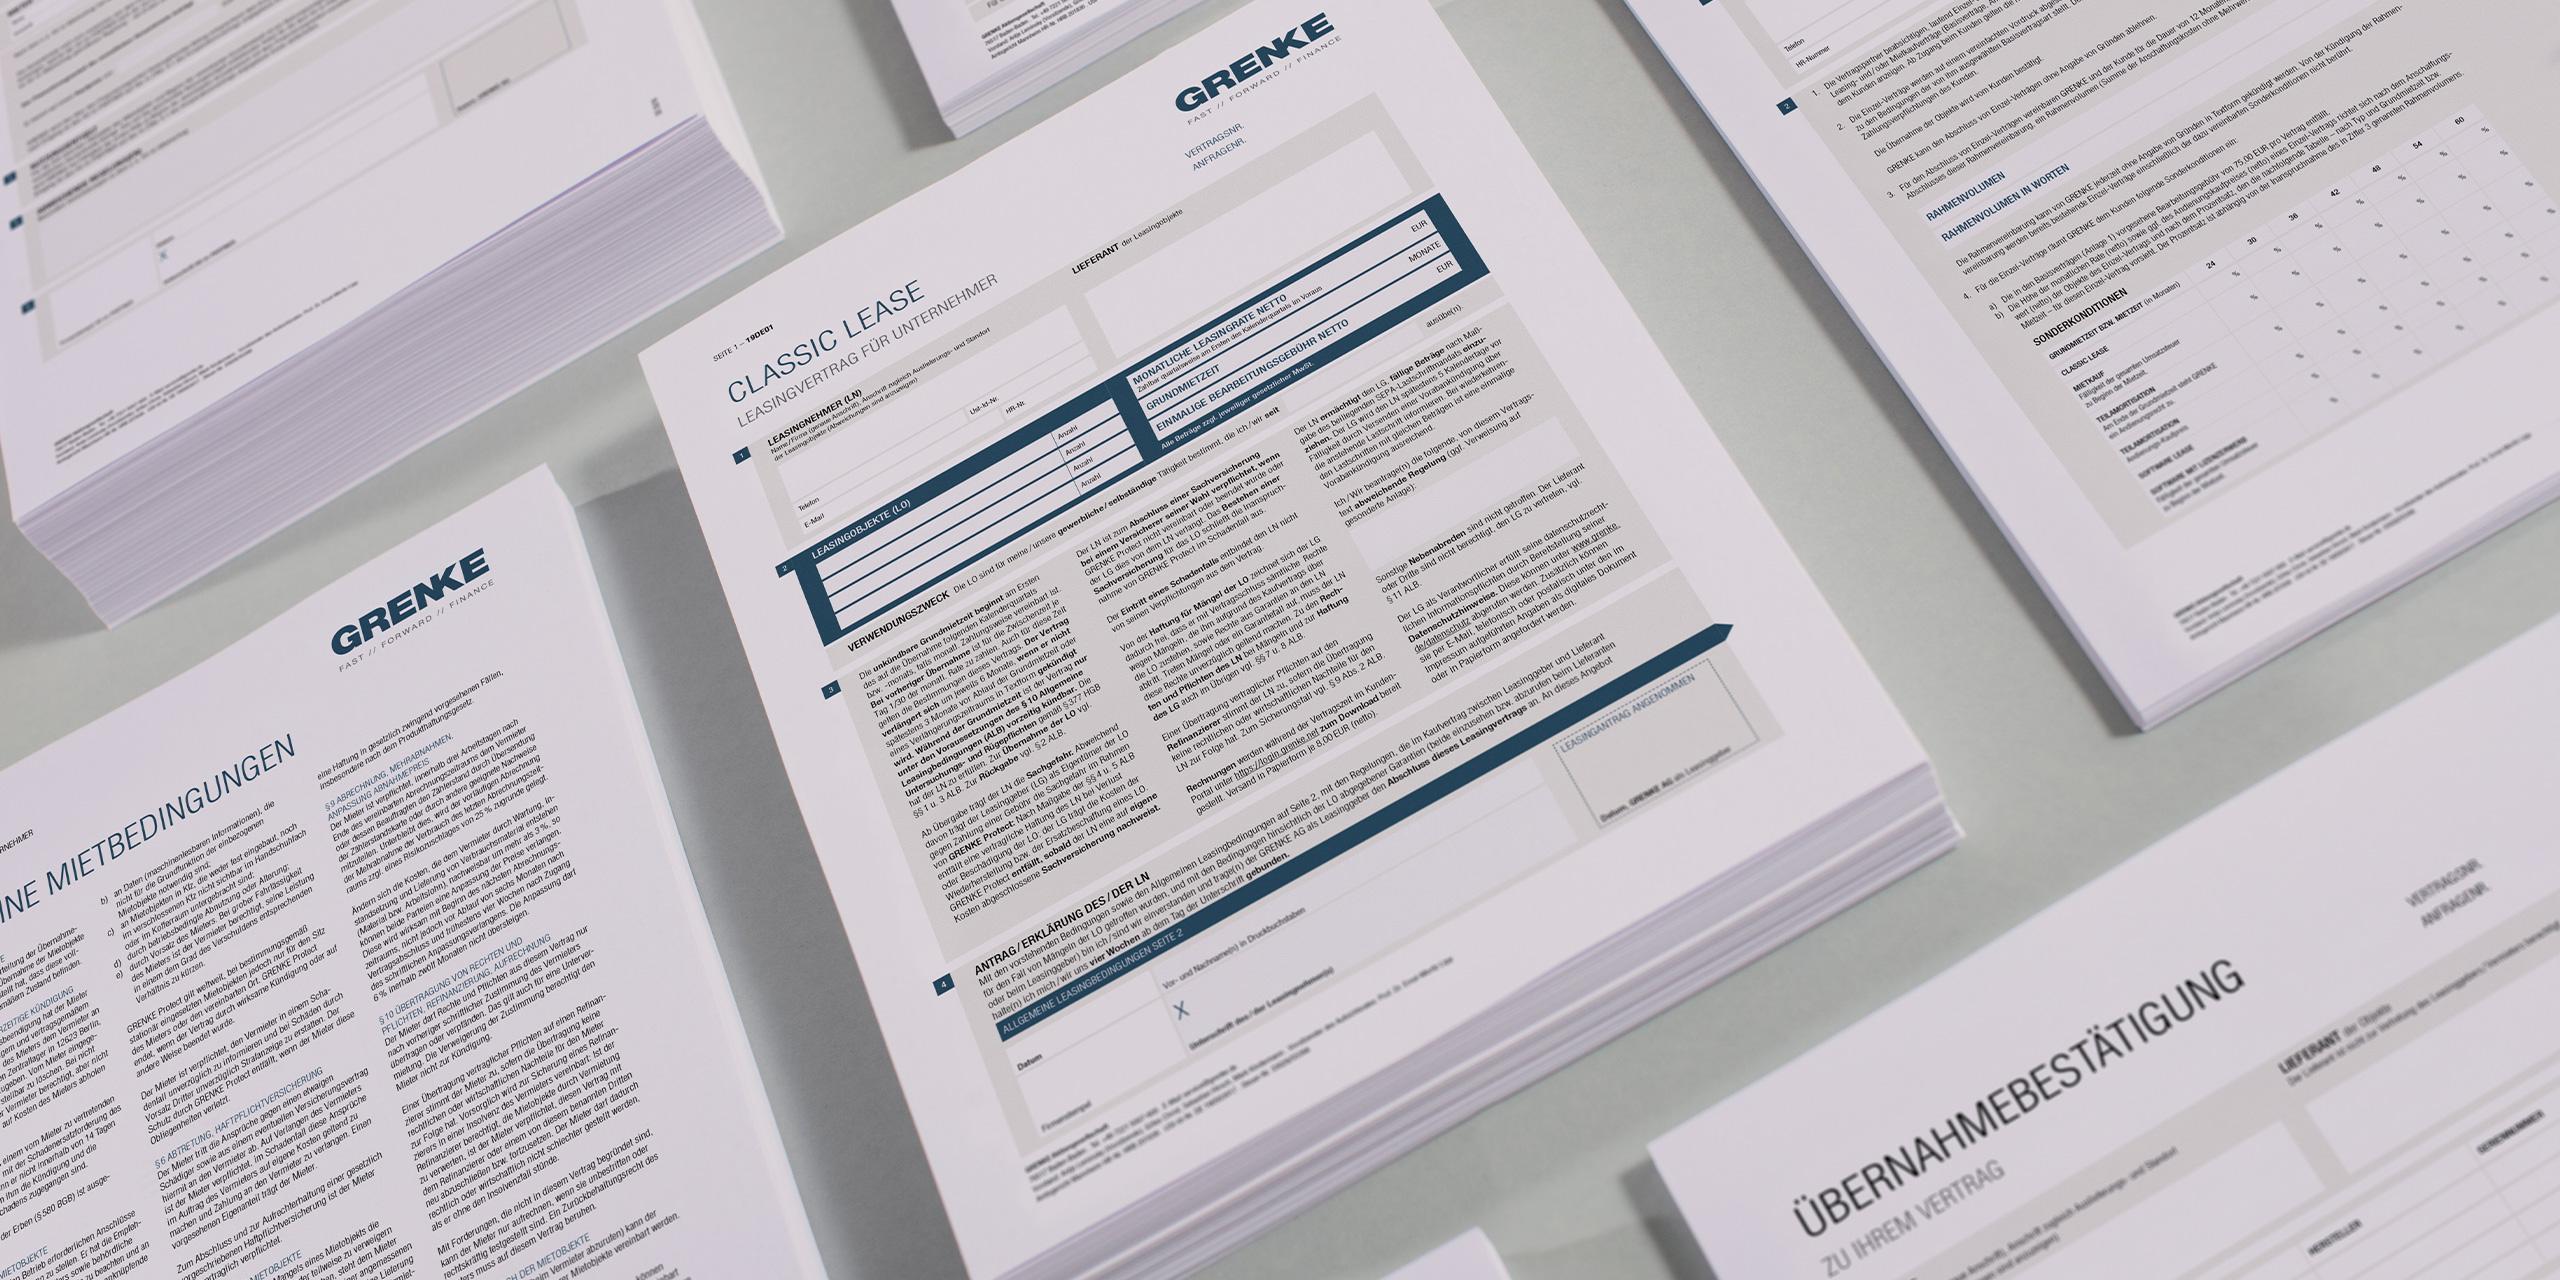 Grenke Verträge Bourdonné Design